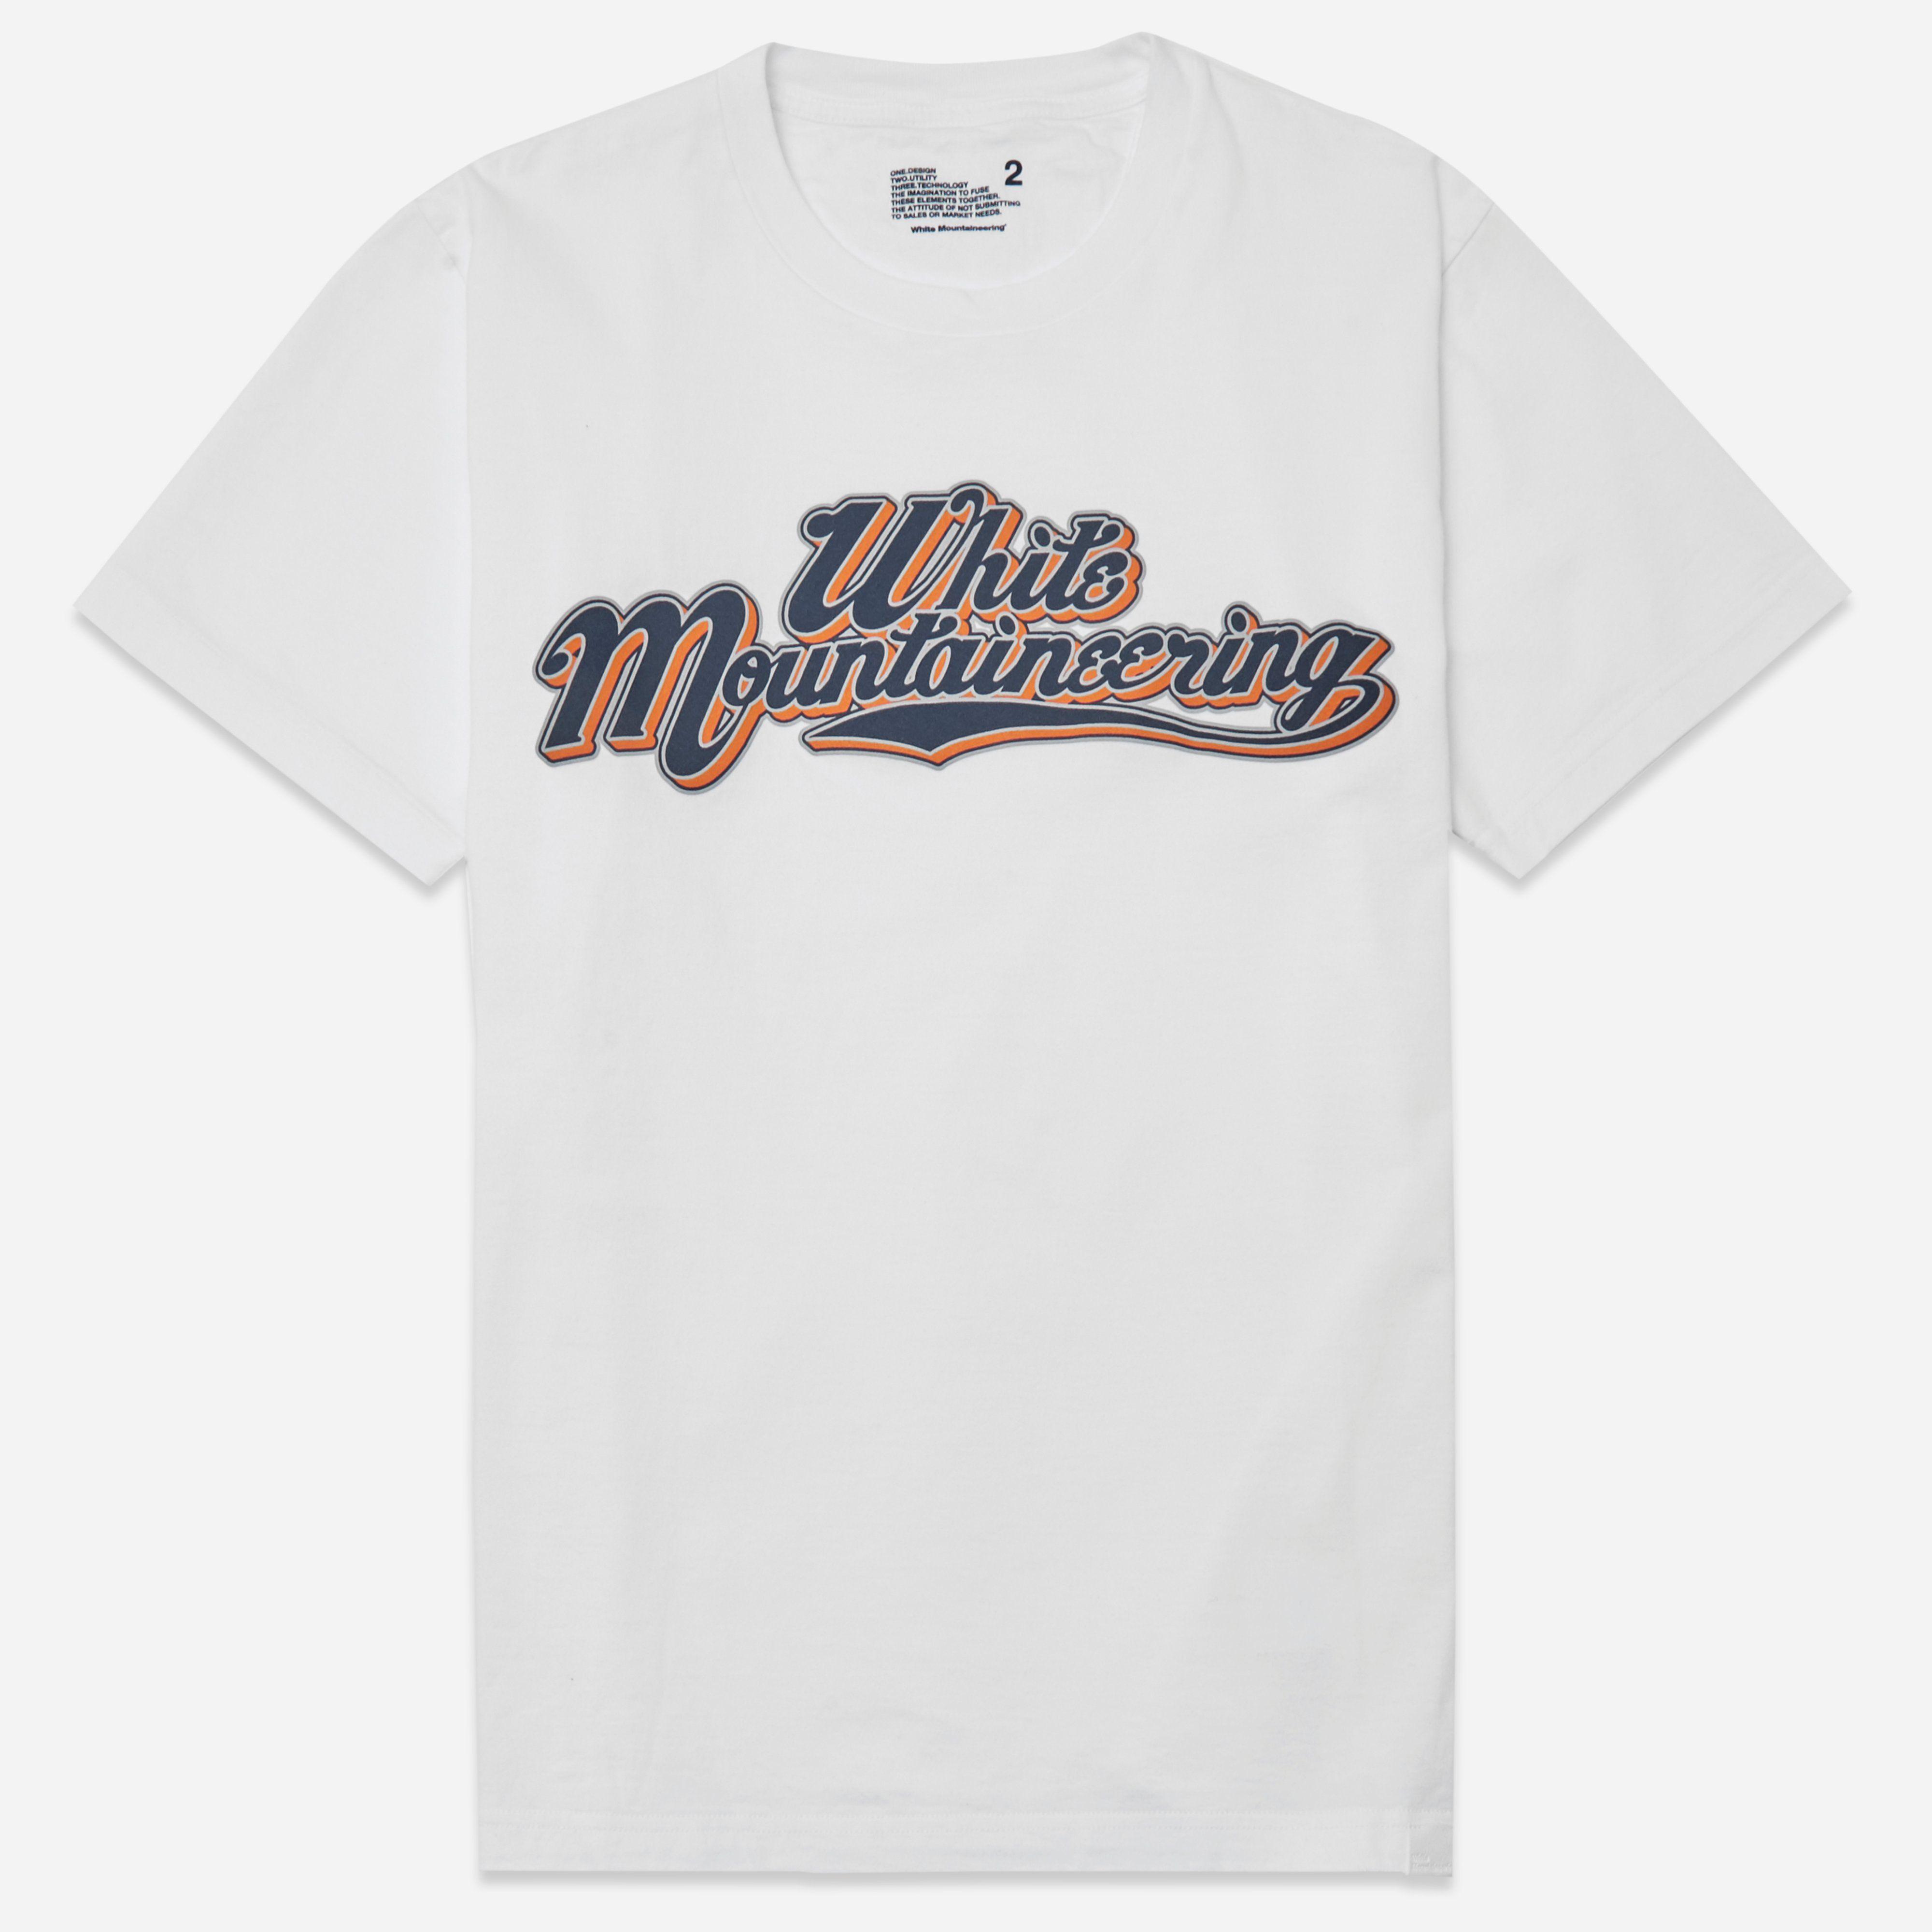 White Mountaineering Printed Team Mountaineering T-shirt